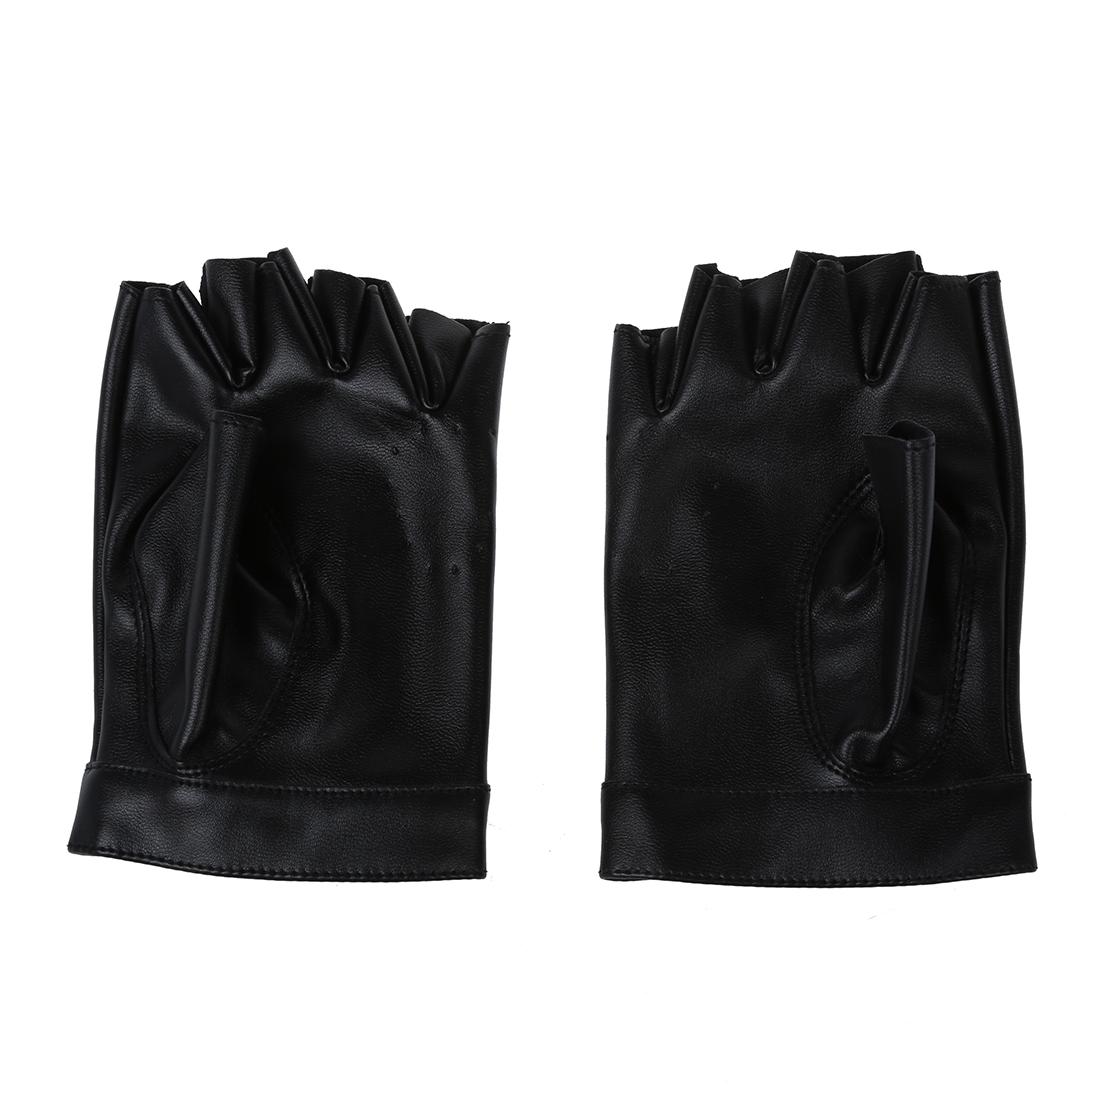 damen pu leder niete fingerlose handschuhe schwarz o1o5 ebay. Black Bedroom Furniture Sets. Home Design Ideas